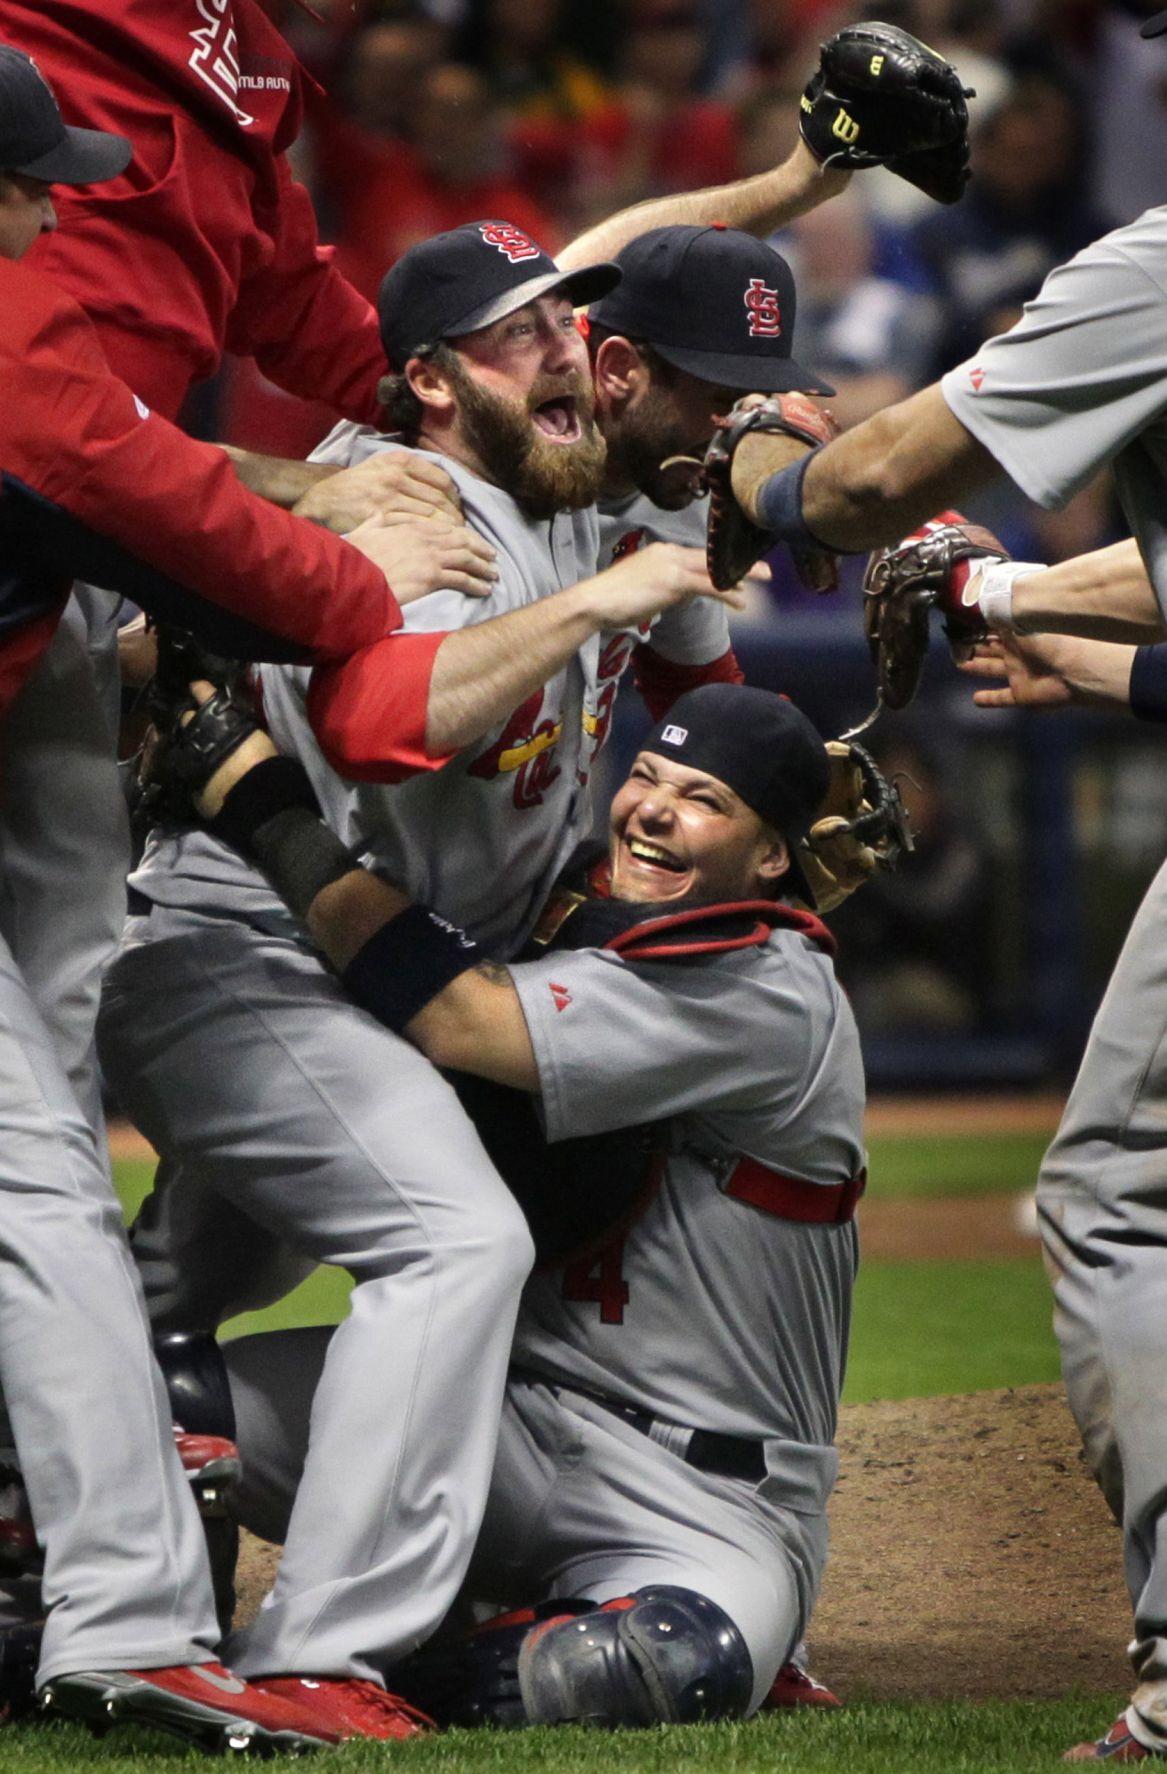 Cardinals win the pennant